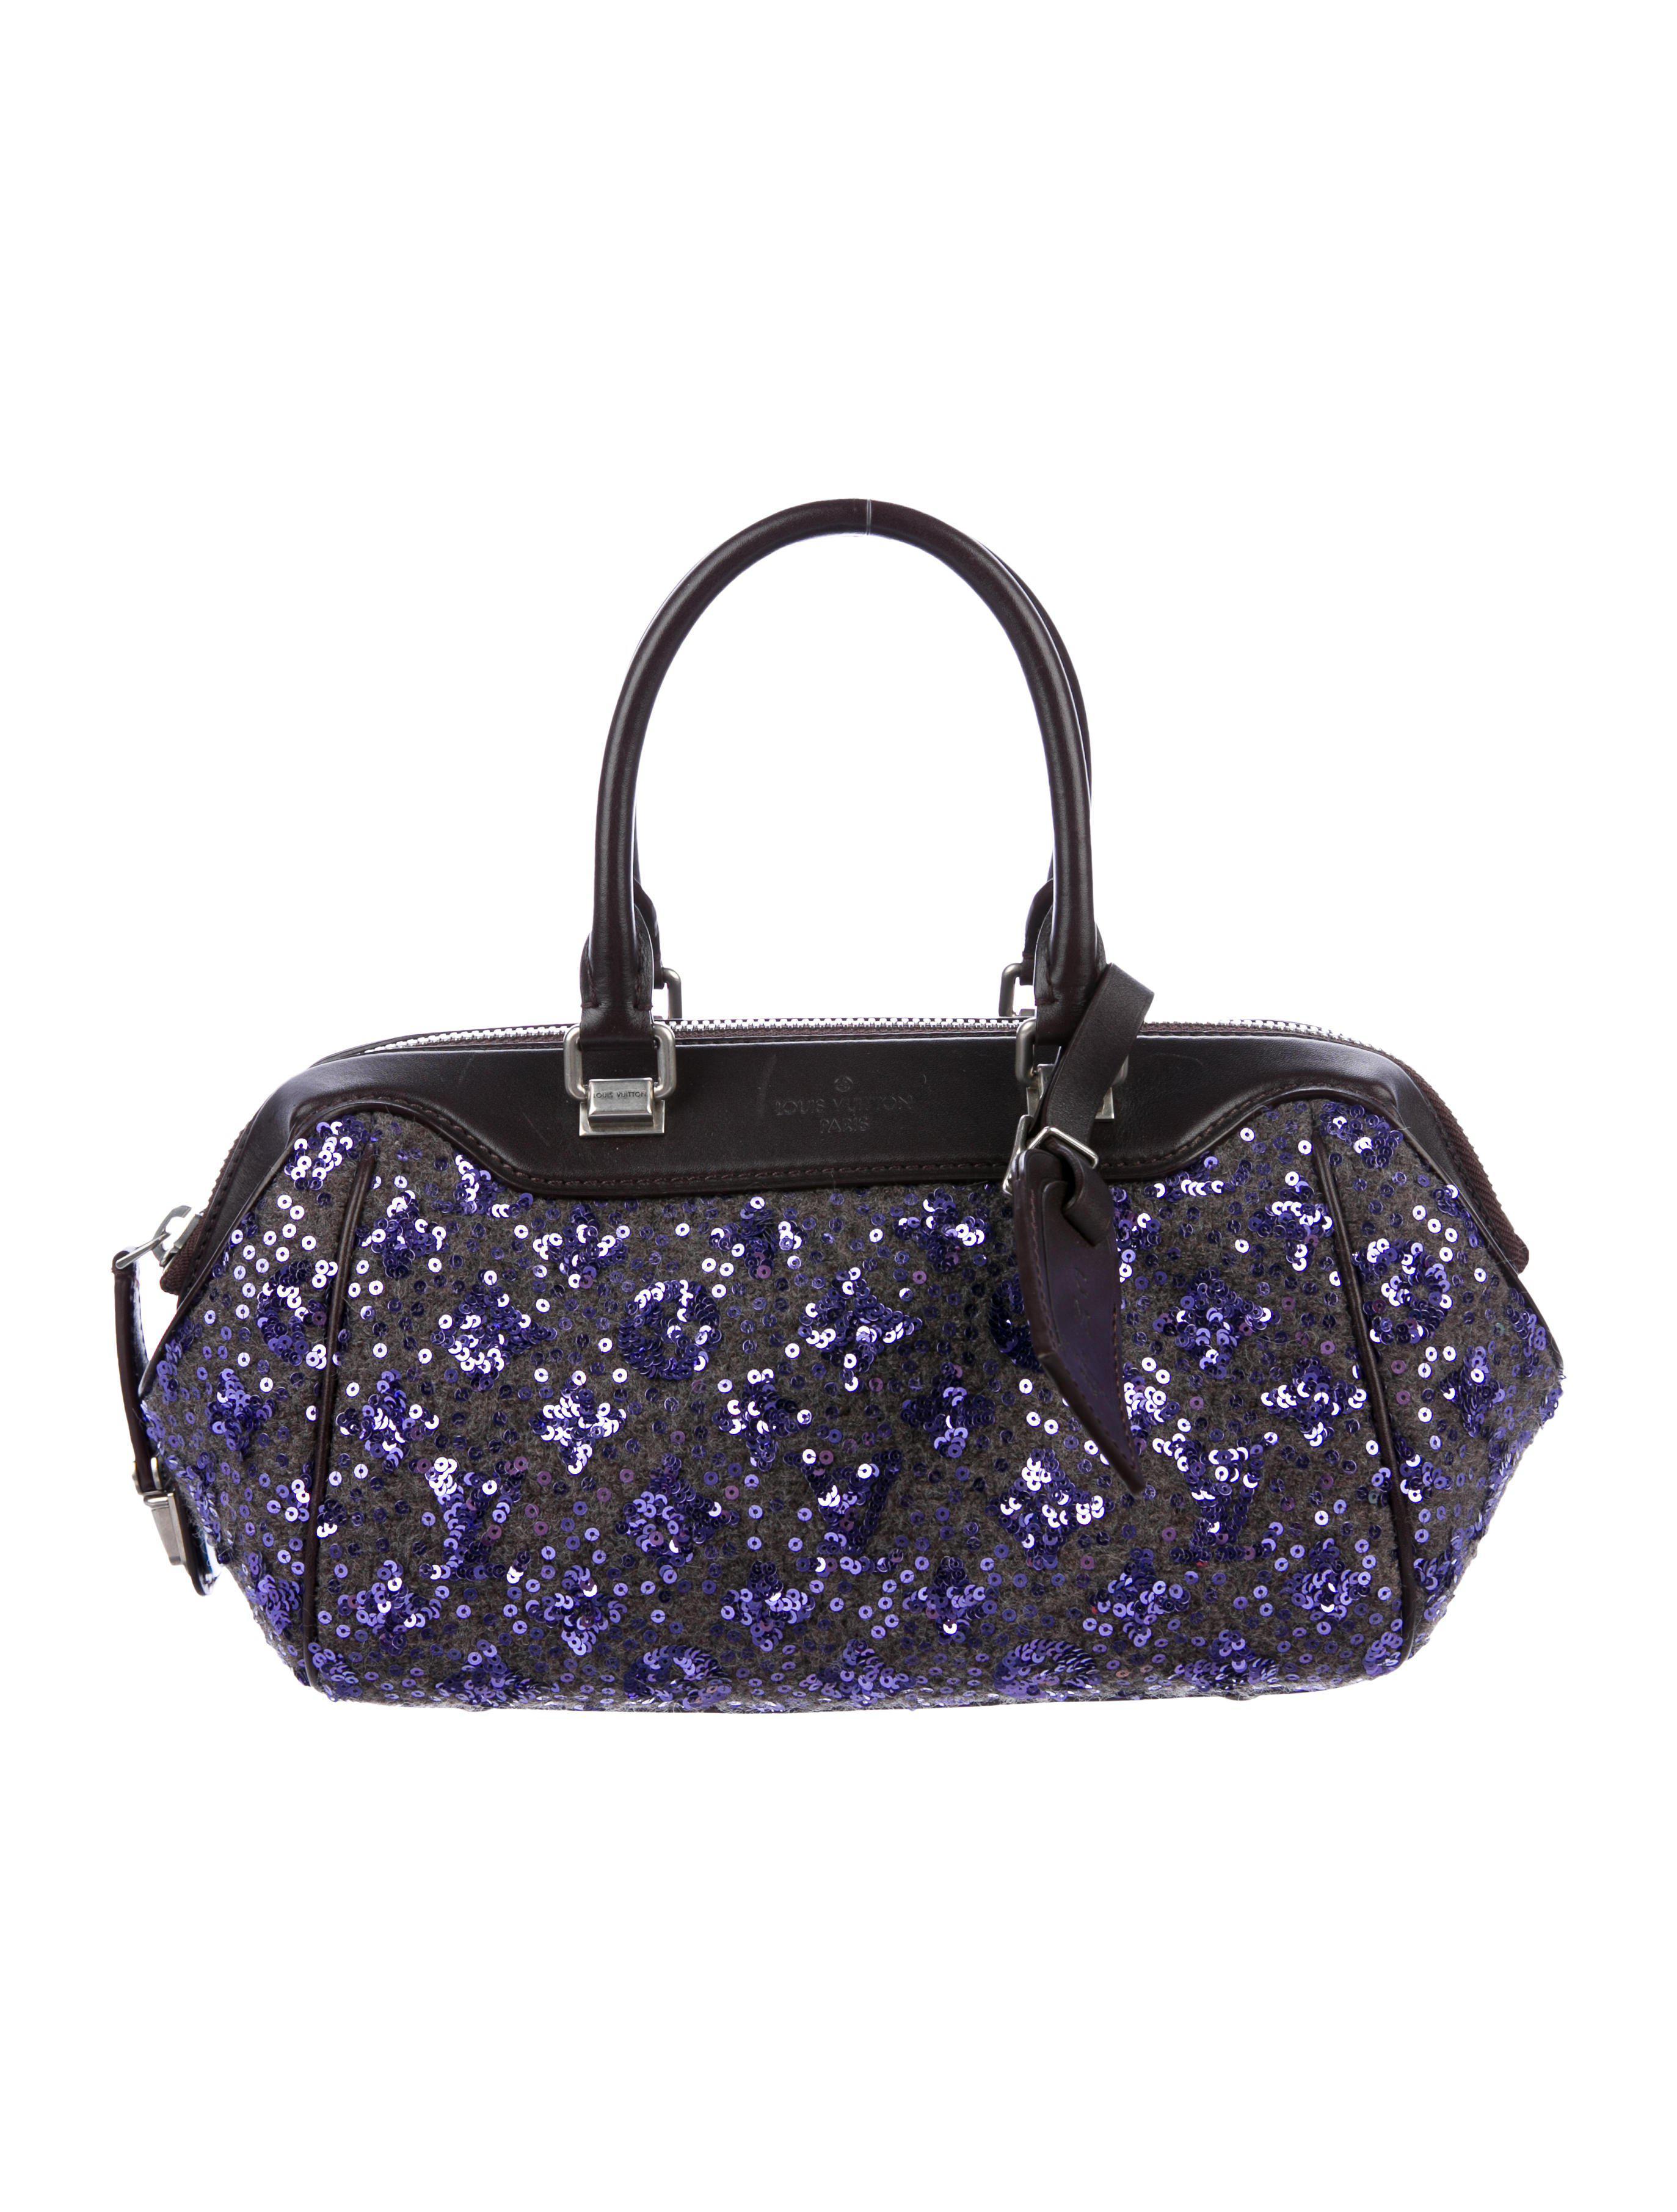 c9c6a5cbacc Lyst - Louis Vuitton Sunshine Express Baby Bag Grey in Metallic